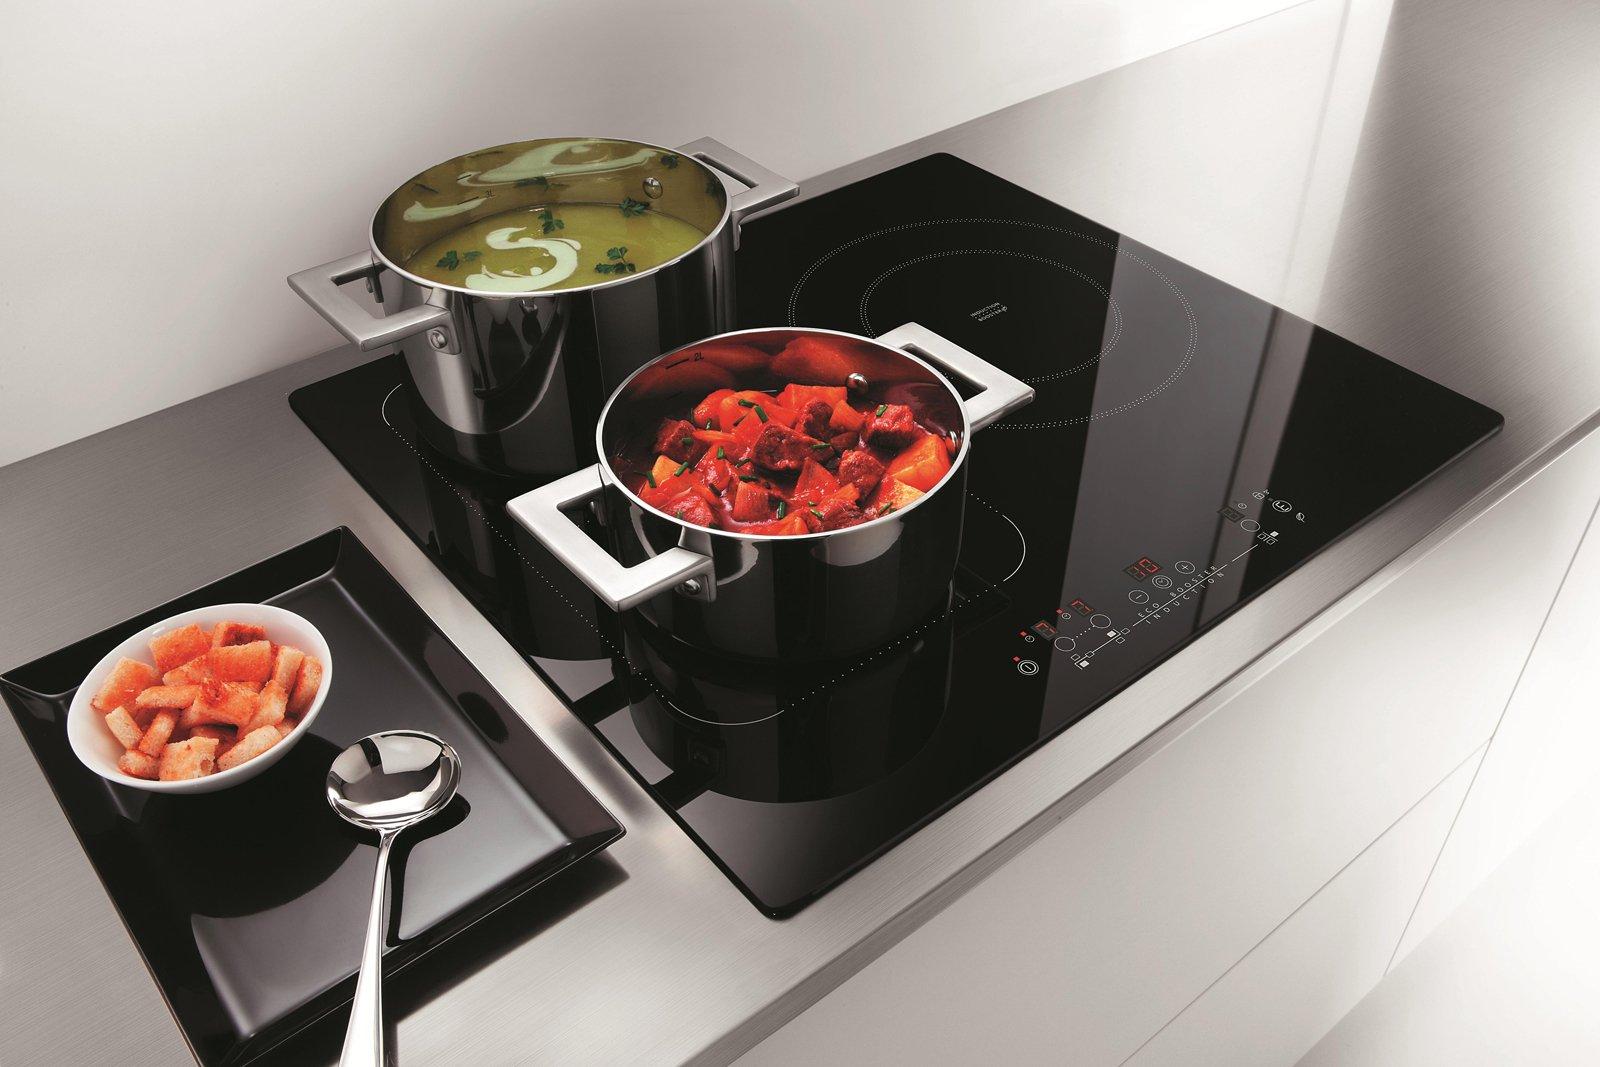 piani cottura. con o senza fiamma - cose di casa - Pentole Per Cucina A Induzione